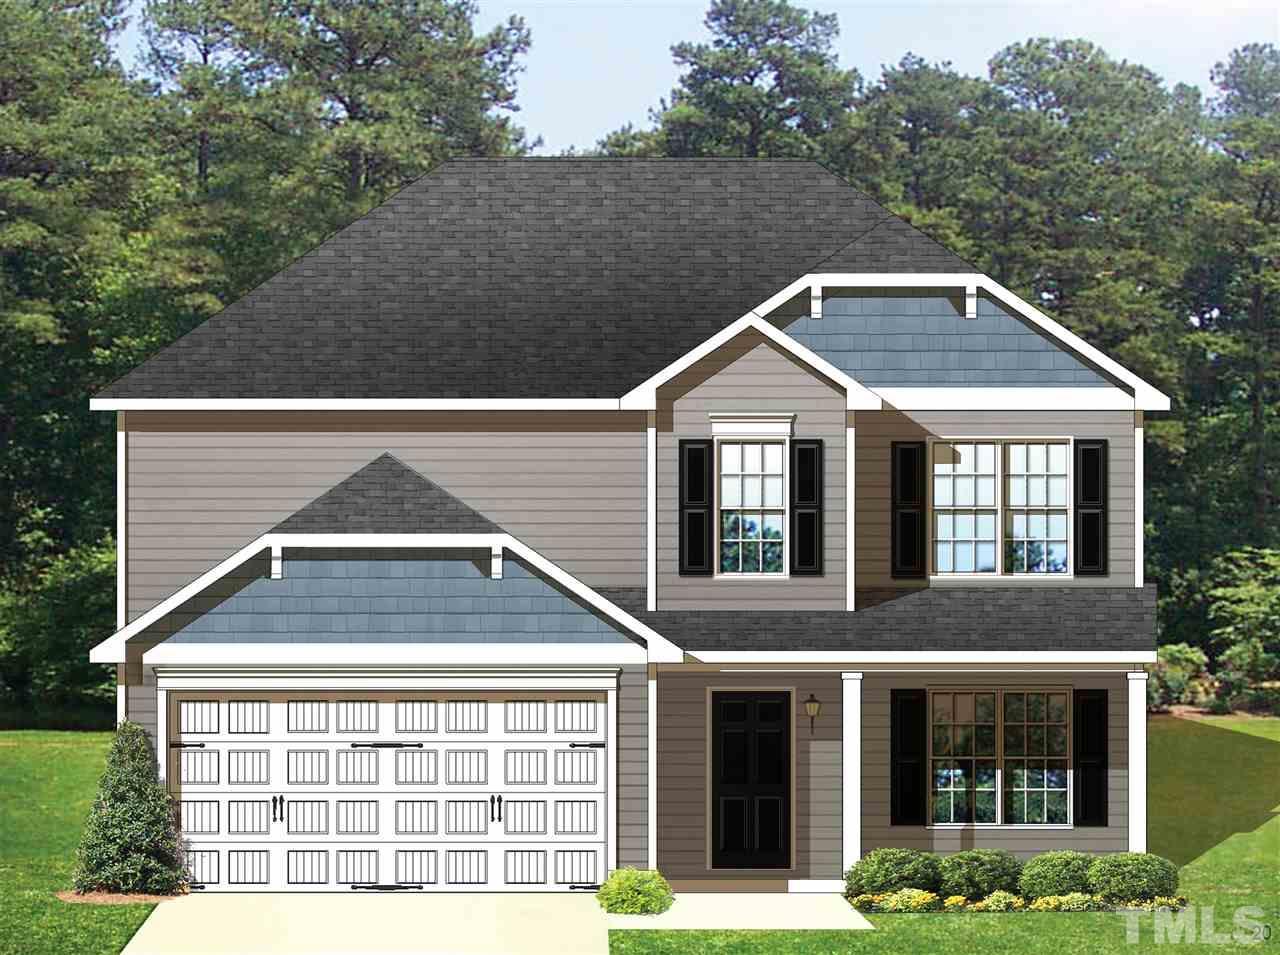 196 MEADOW HILLS Drive, Four Oaks, NC 27524